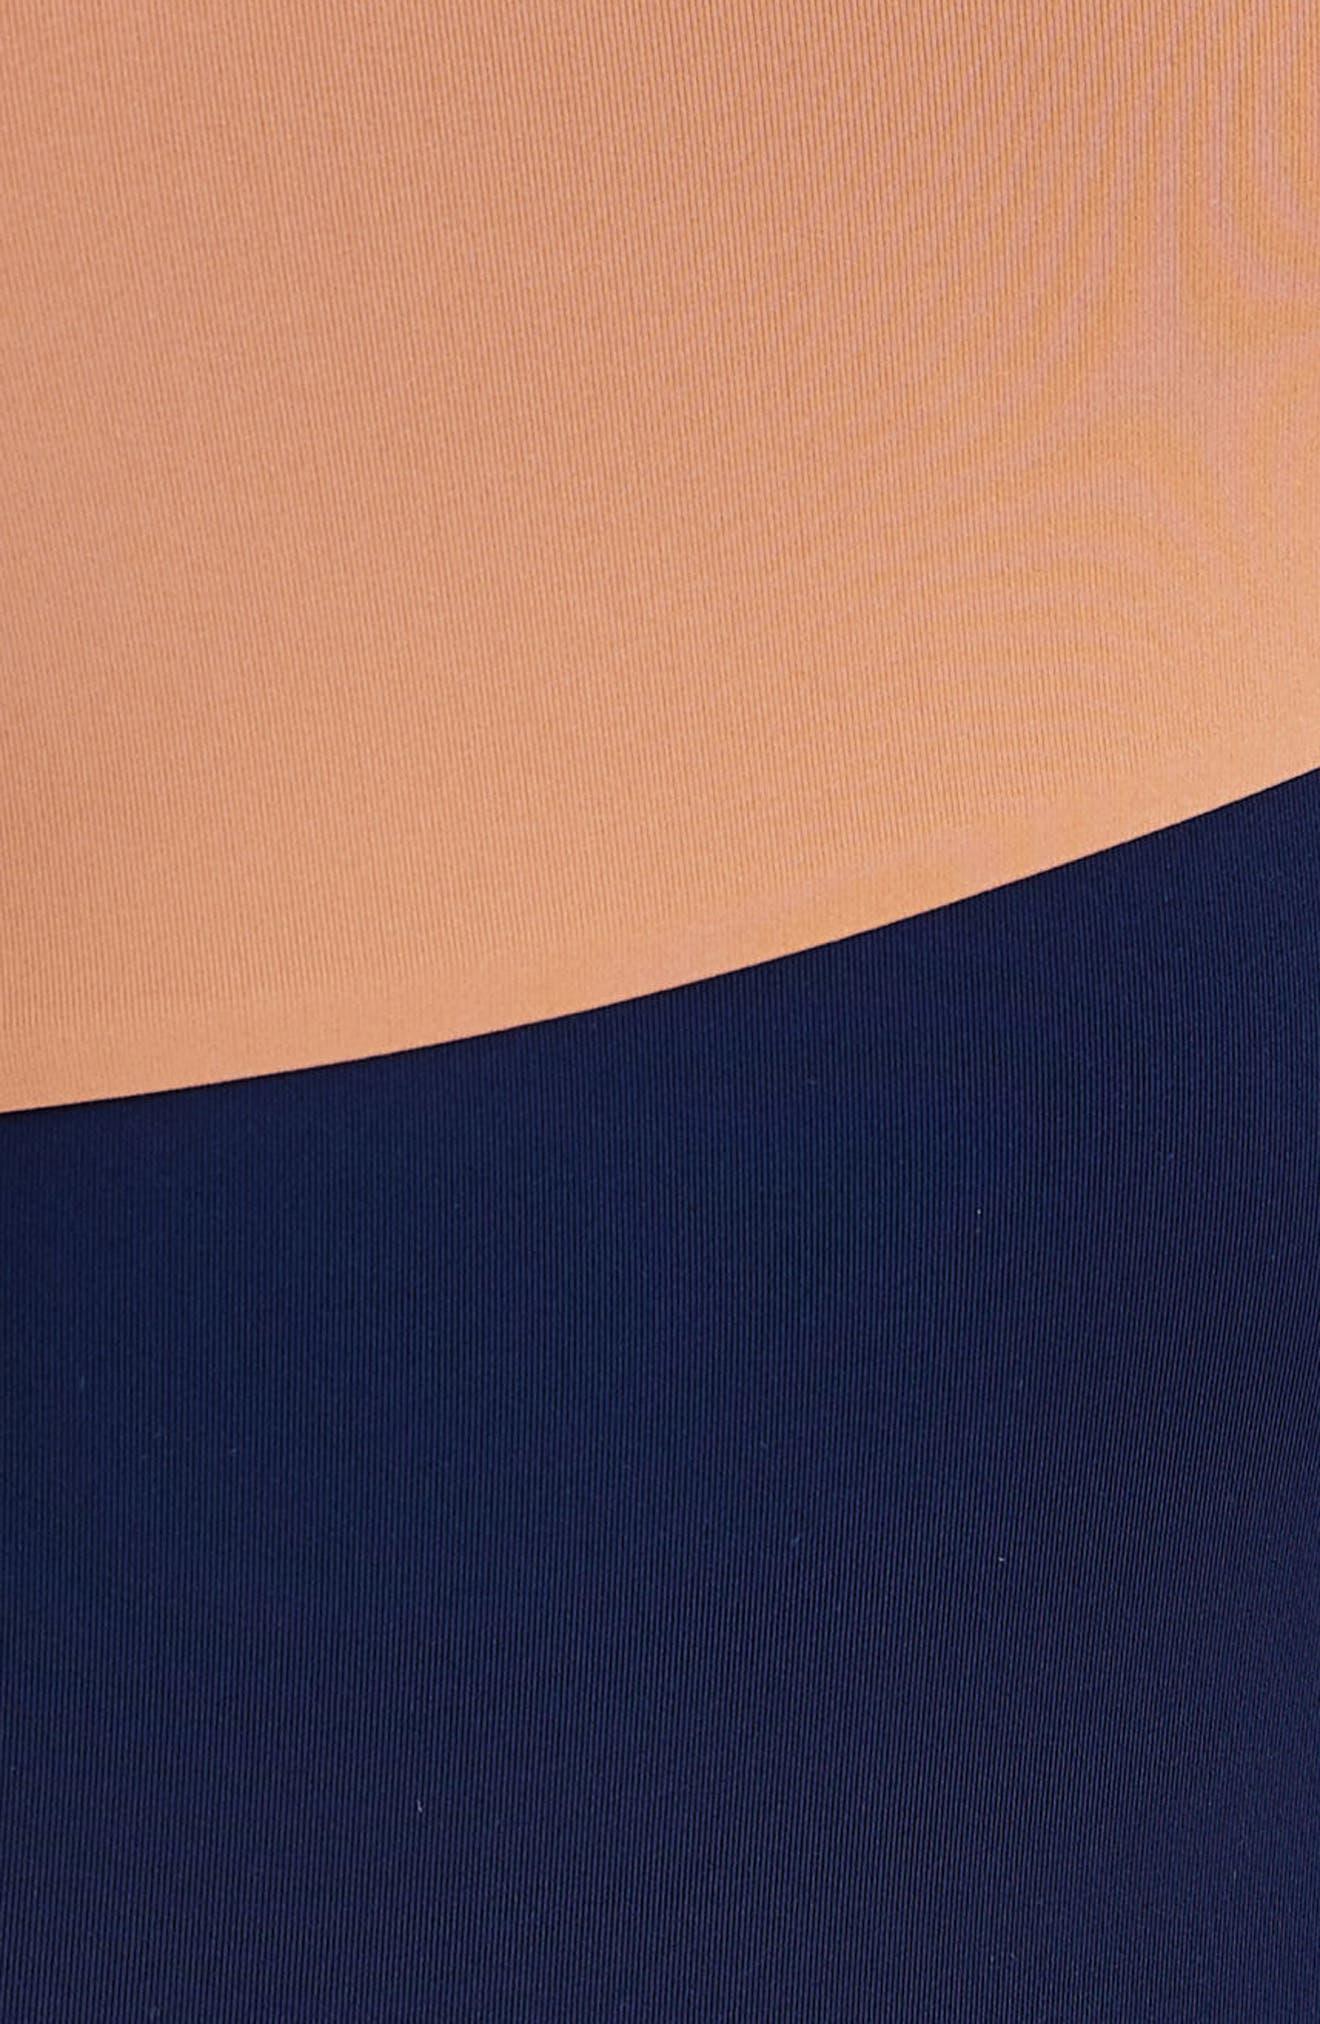 Sienna One-Shoulder Swimsuit,                             Alternate thumbnail 4, color,                             Blue Shadow/ Sandy